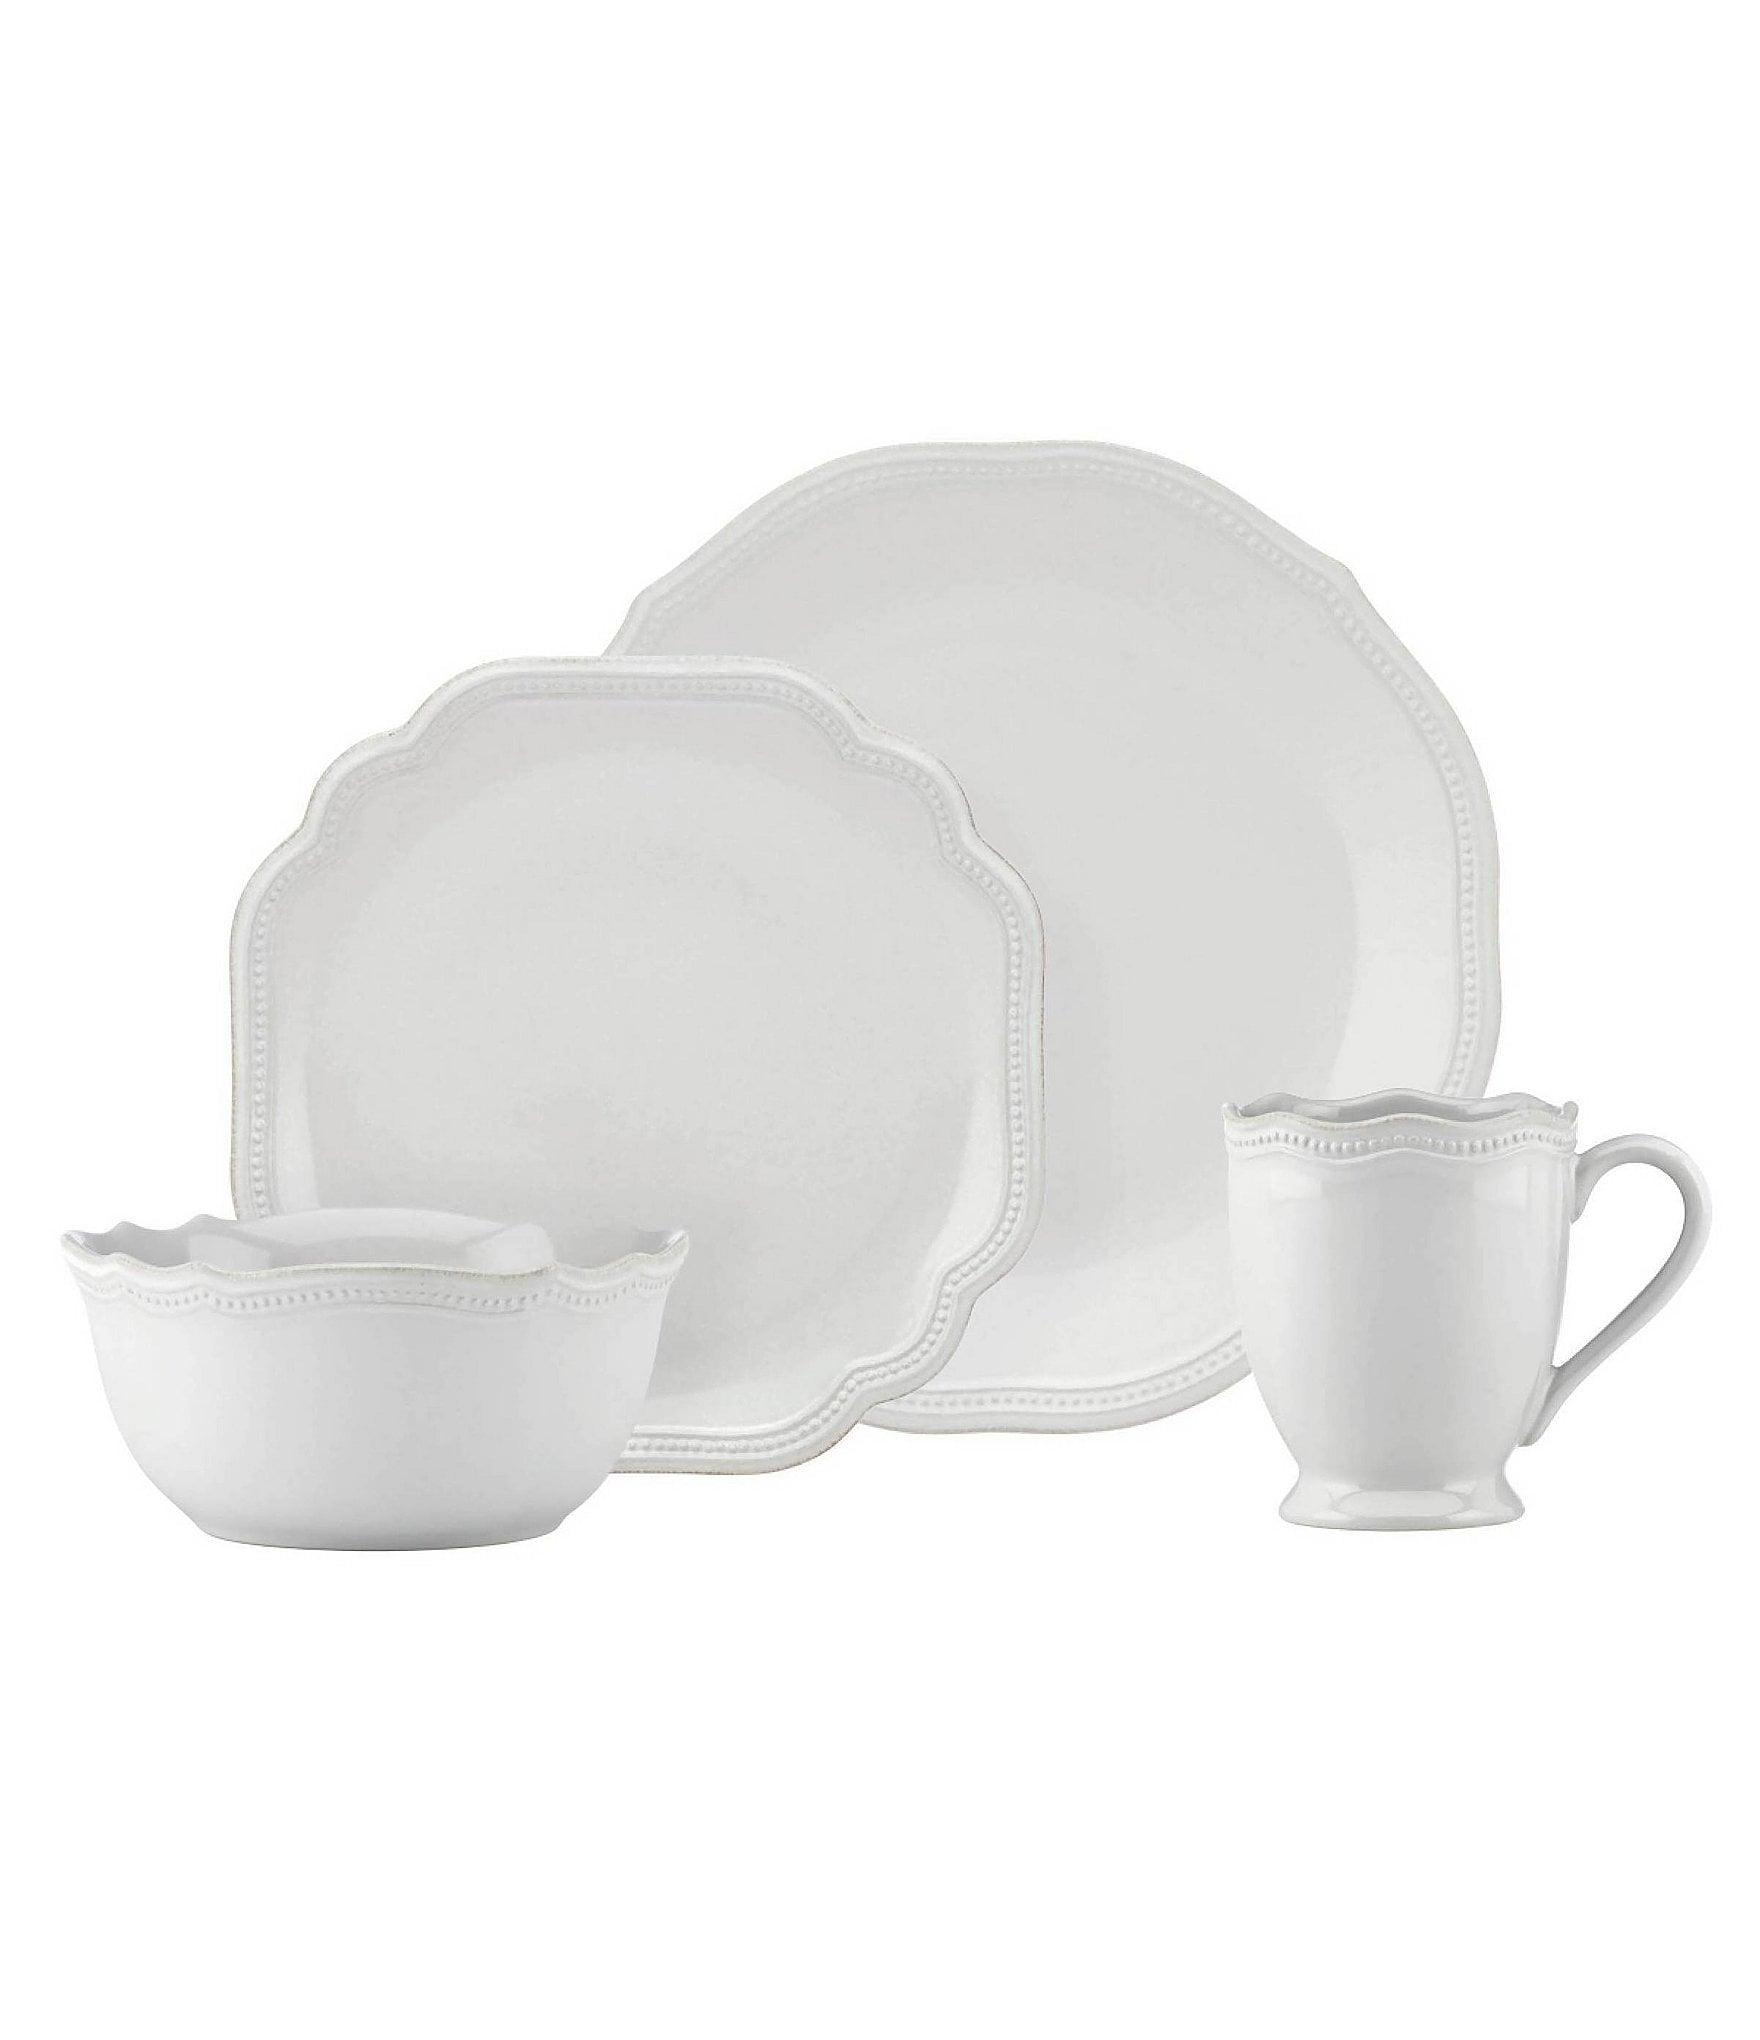 Best dinnerware set: Home: Kitchen, Dining & Bedding   Dillards.com CG68